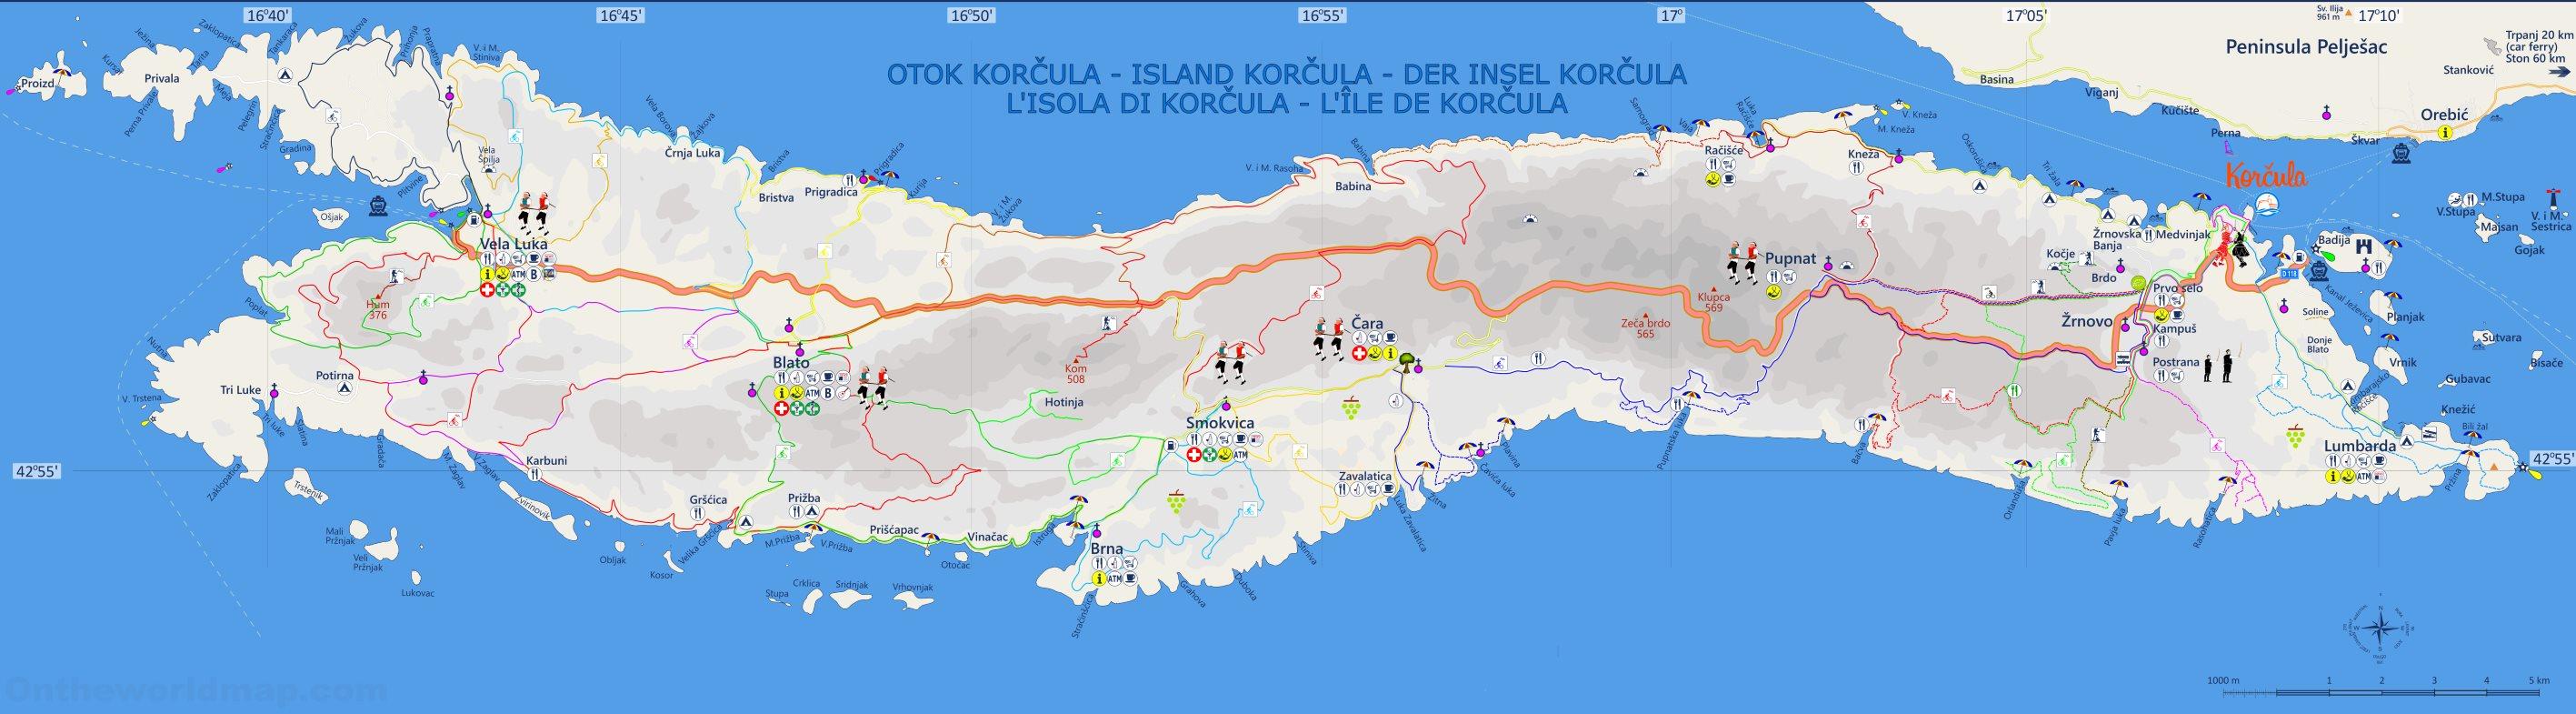 detailed-tourist-map-of-korcula.jpg